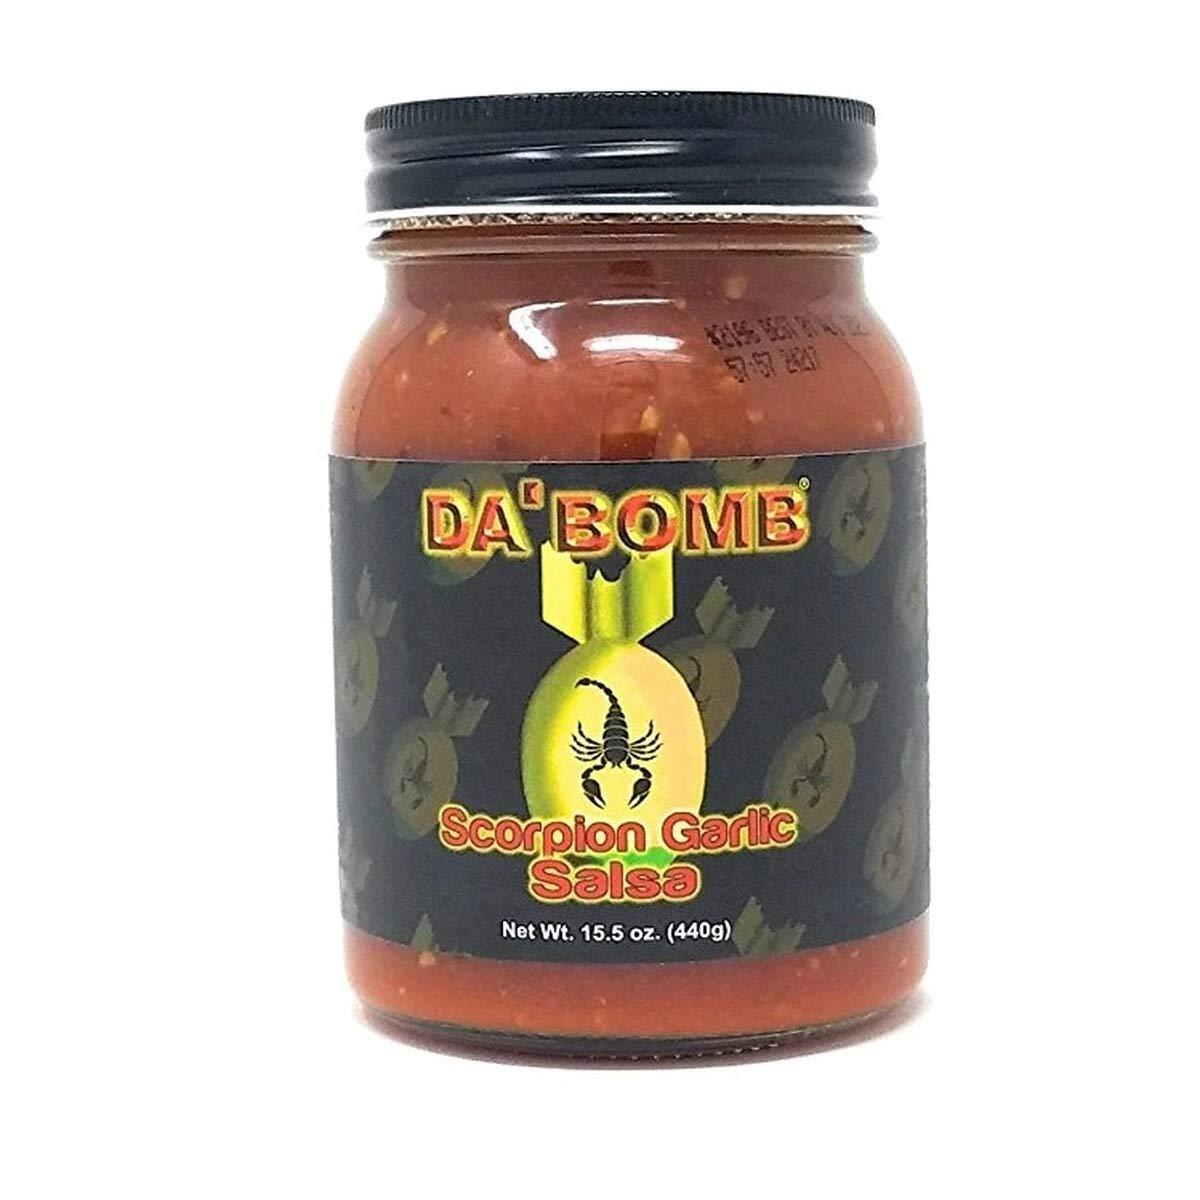 Da Bomb Scorpion Garlic Salsa - 15.5oz by Da Bomb